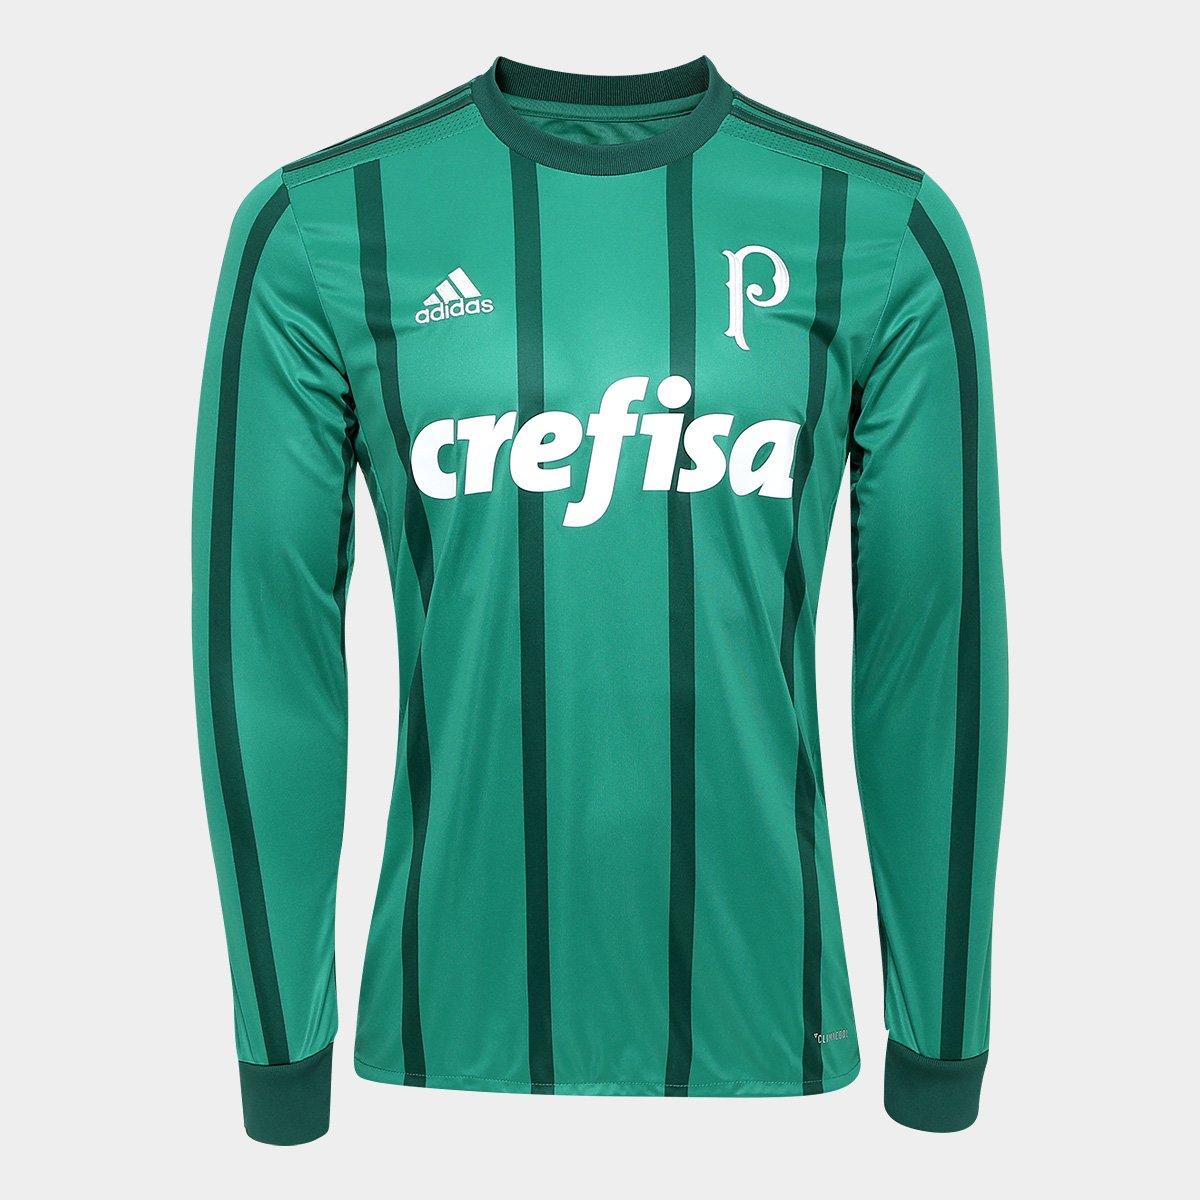 d8c295ef6956d Camisa Palmeiras I 17 18 Manga Longa s nº - Torcedor Adidas Masculina -  Compre Agora